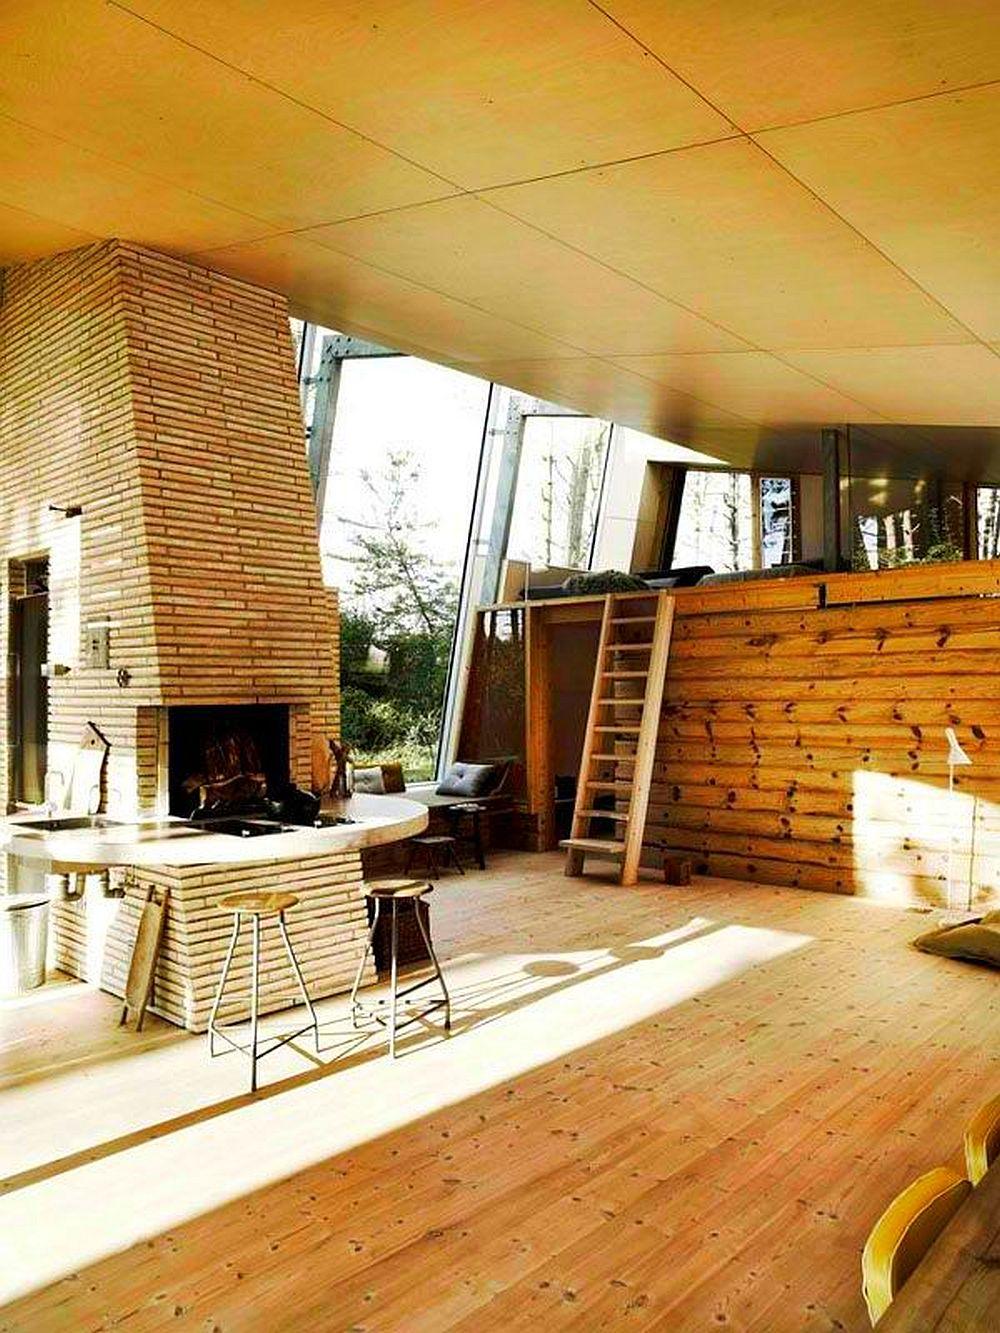 adelaparvu.com despre casa de vacanta moderna, casa daneza, casa din busteni de lemn moderna, arhitect Jesper Brask, Tree House (14)